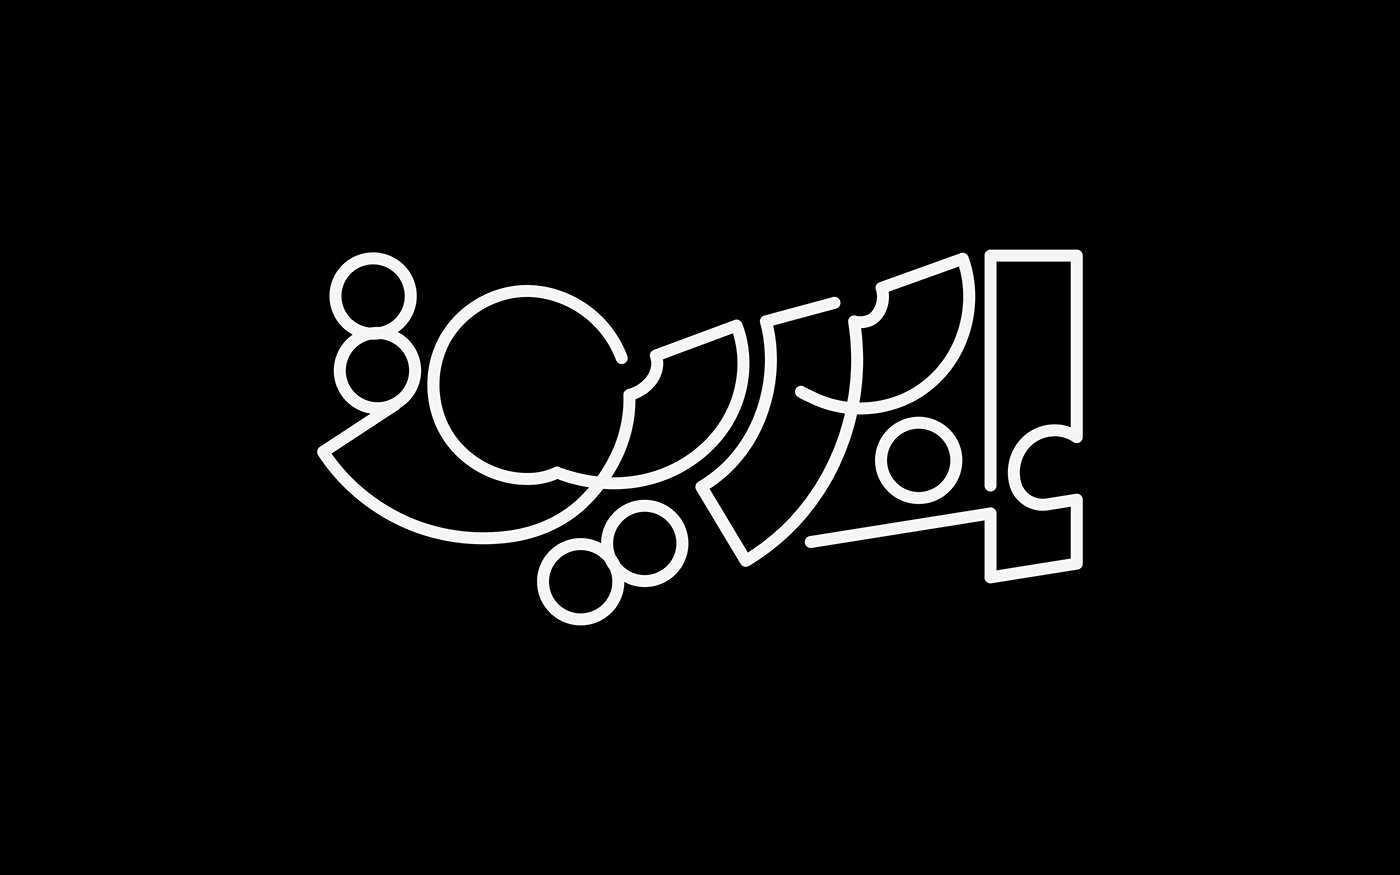 arabic arabic typography Calligraphy   challenge hibrayer lettering type typo typographic typography